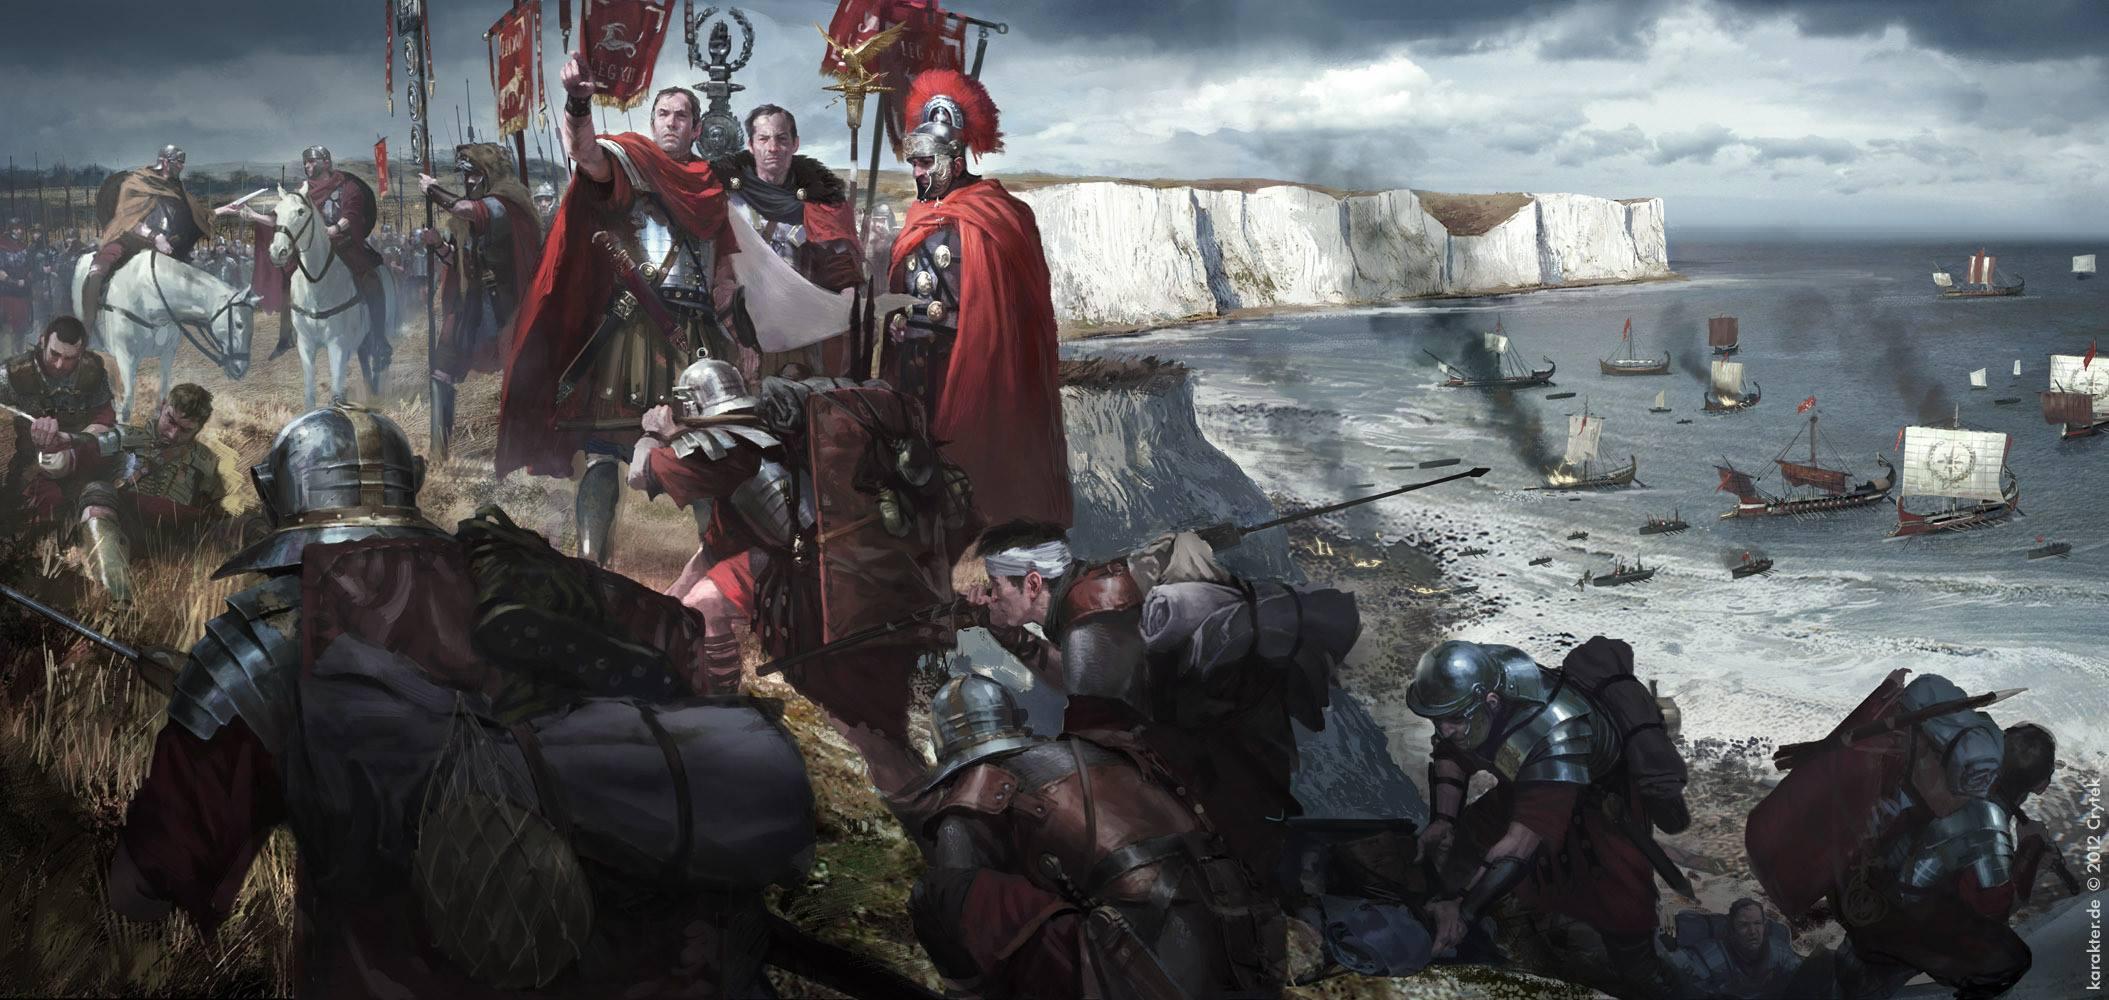 Wallpaper roman legionnaire centurion 2109x1000 - Caesar hd wallpaper ...